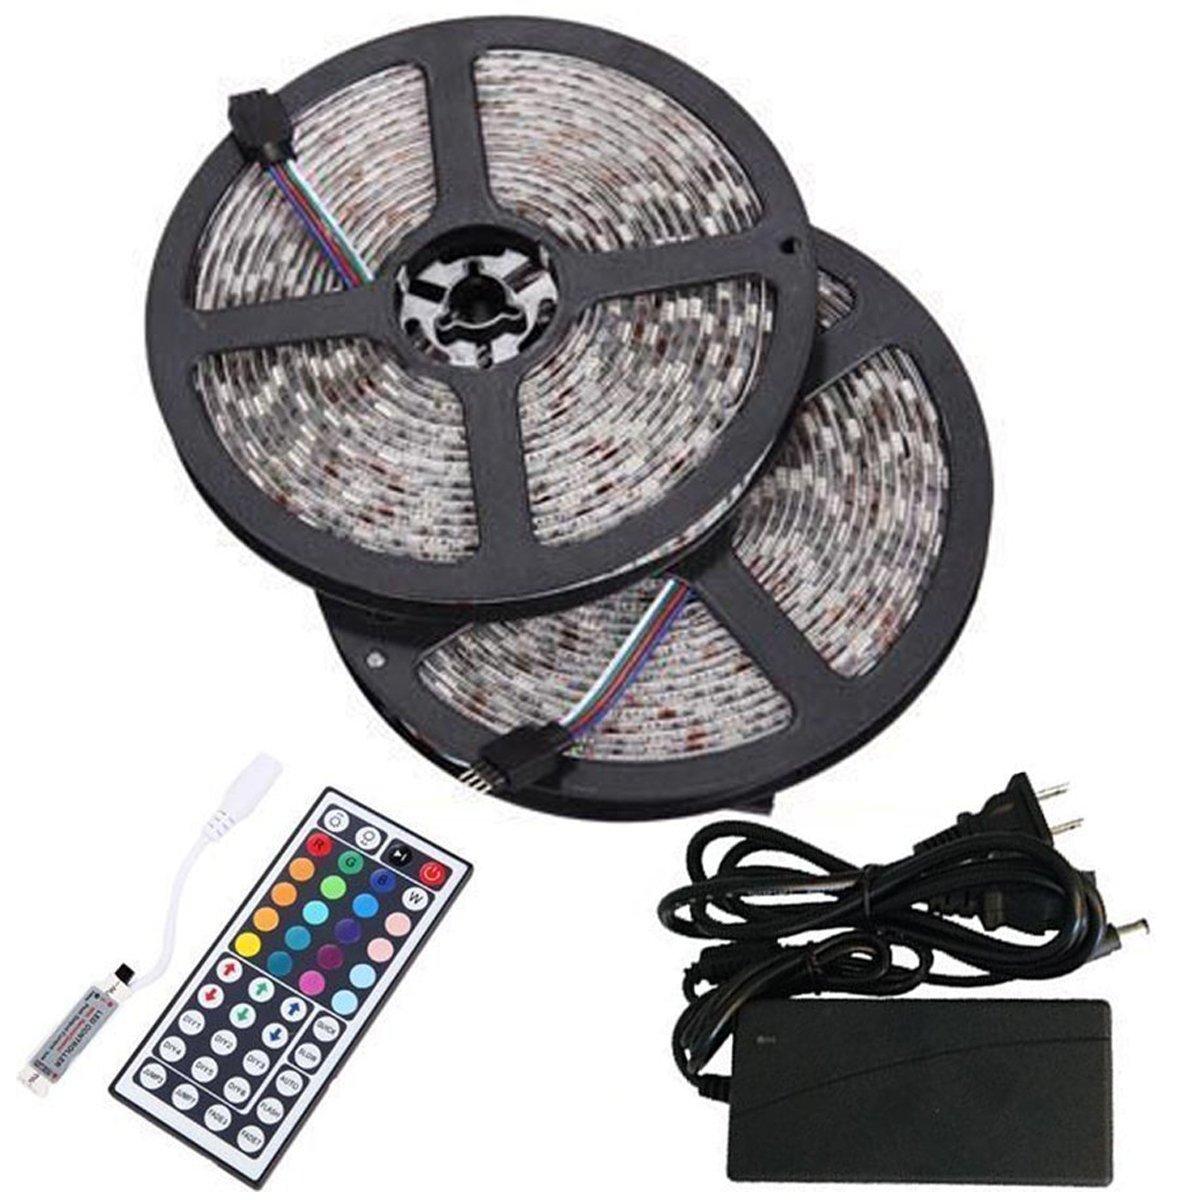 BMOUO 2 Reels 12V 32.8ft Waterproof Flexible RGB LED Strip Light Kit, Multi-colored, SMD5050 300 LEDs, LED Strip Kit & MINI 44-key IR Controller + 12V 5A Power Supply, Adhesive Light Strips